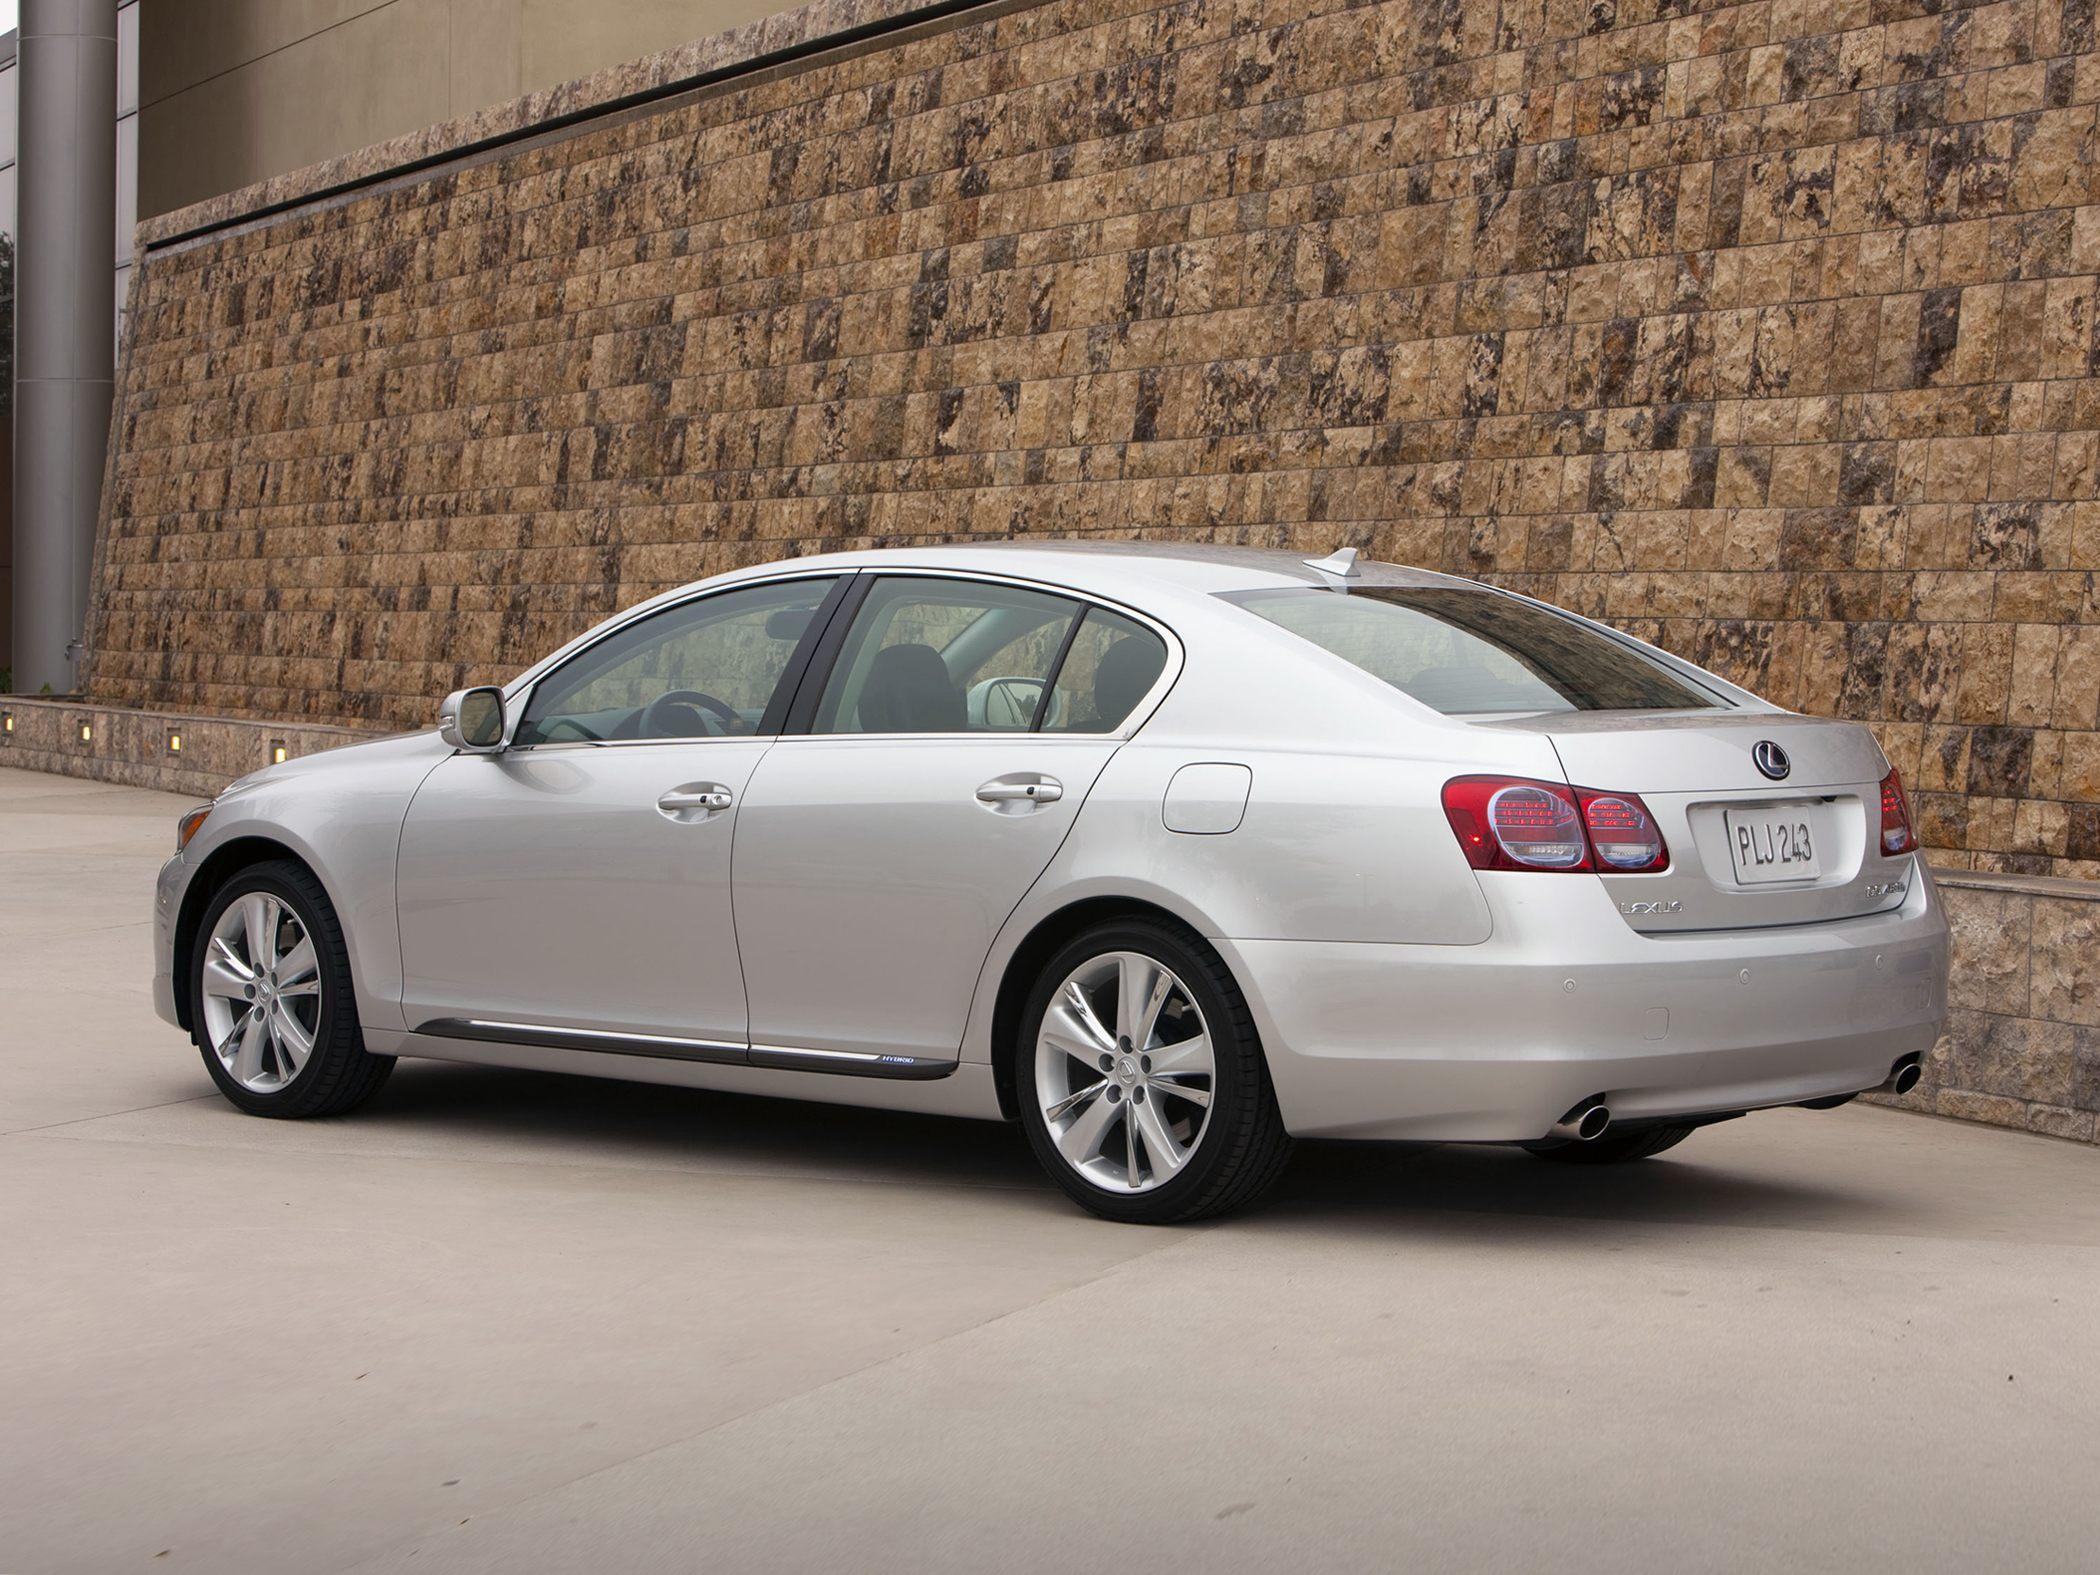 Lexus Is 450 >> 2011 LEXUS GS 450H - Image #14